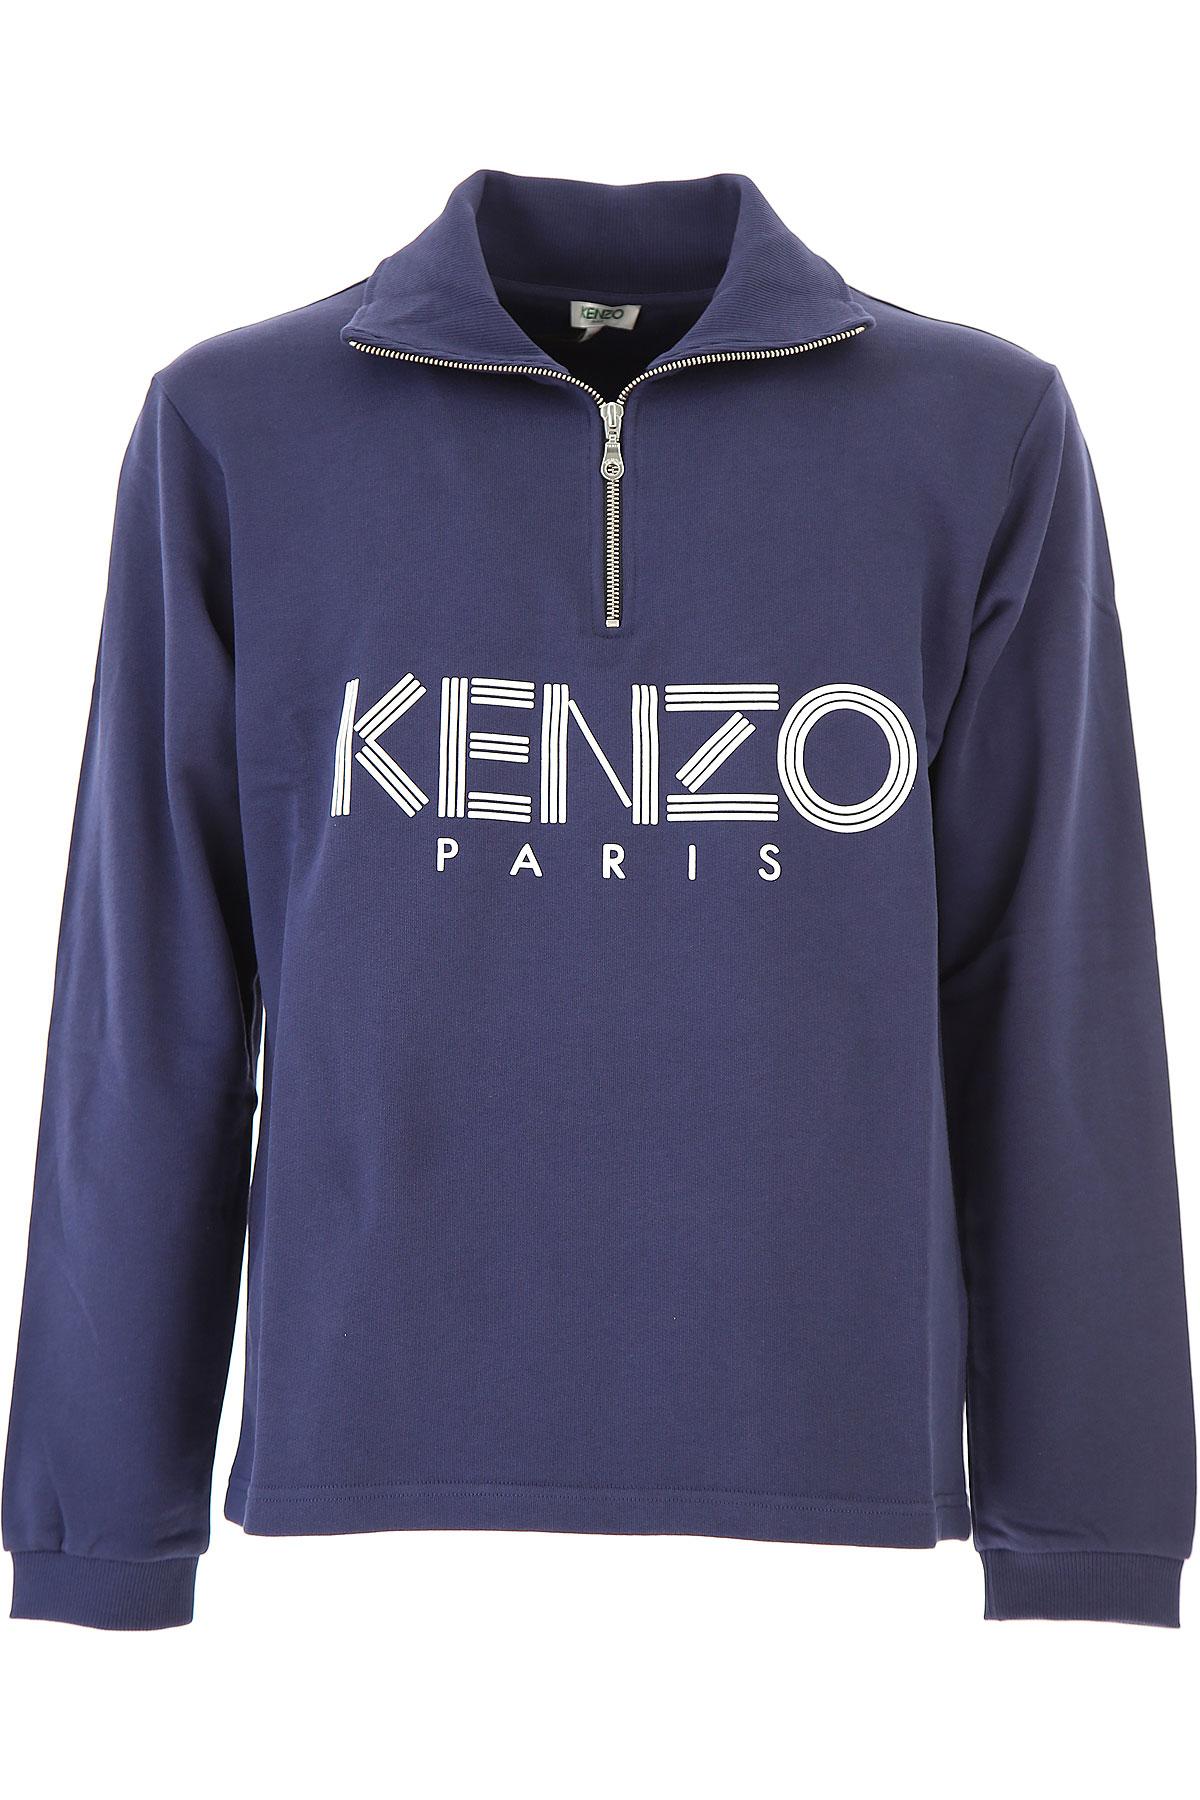 Kenzo Sweatshirt for Men On Sale, Blue, Cotton, 2017, L XL XS USA-417747